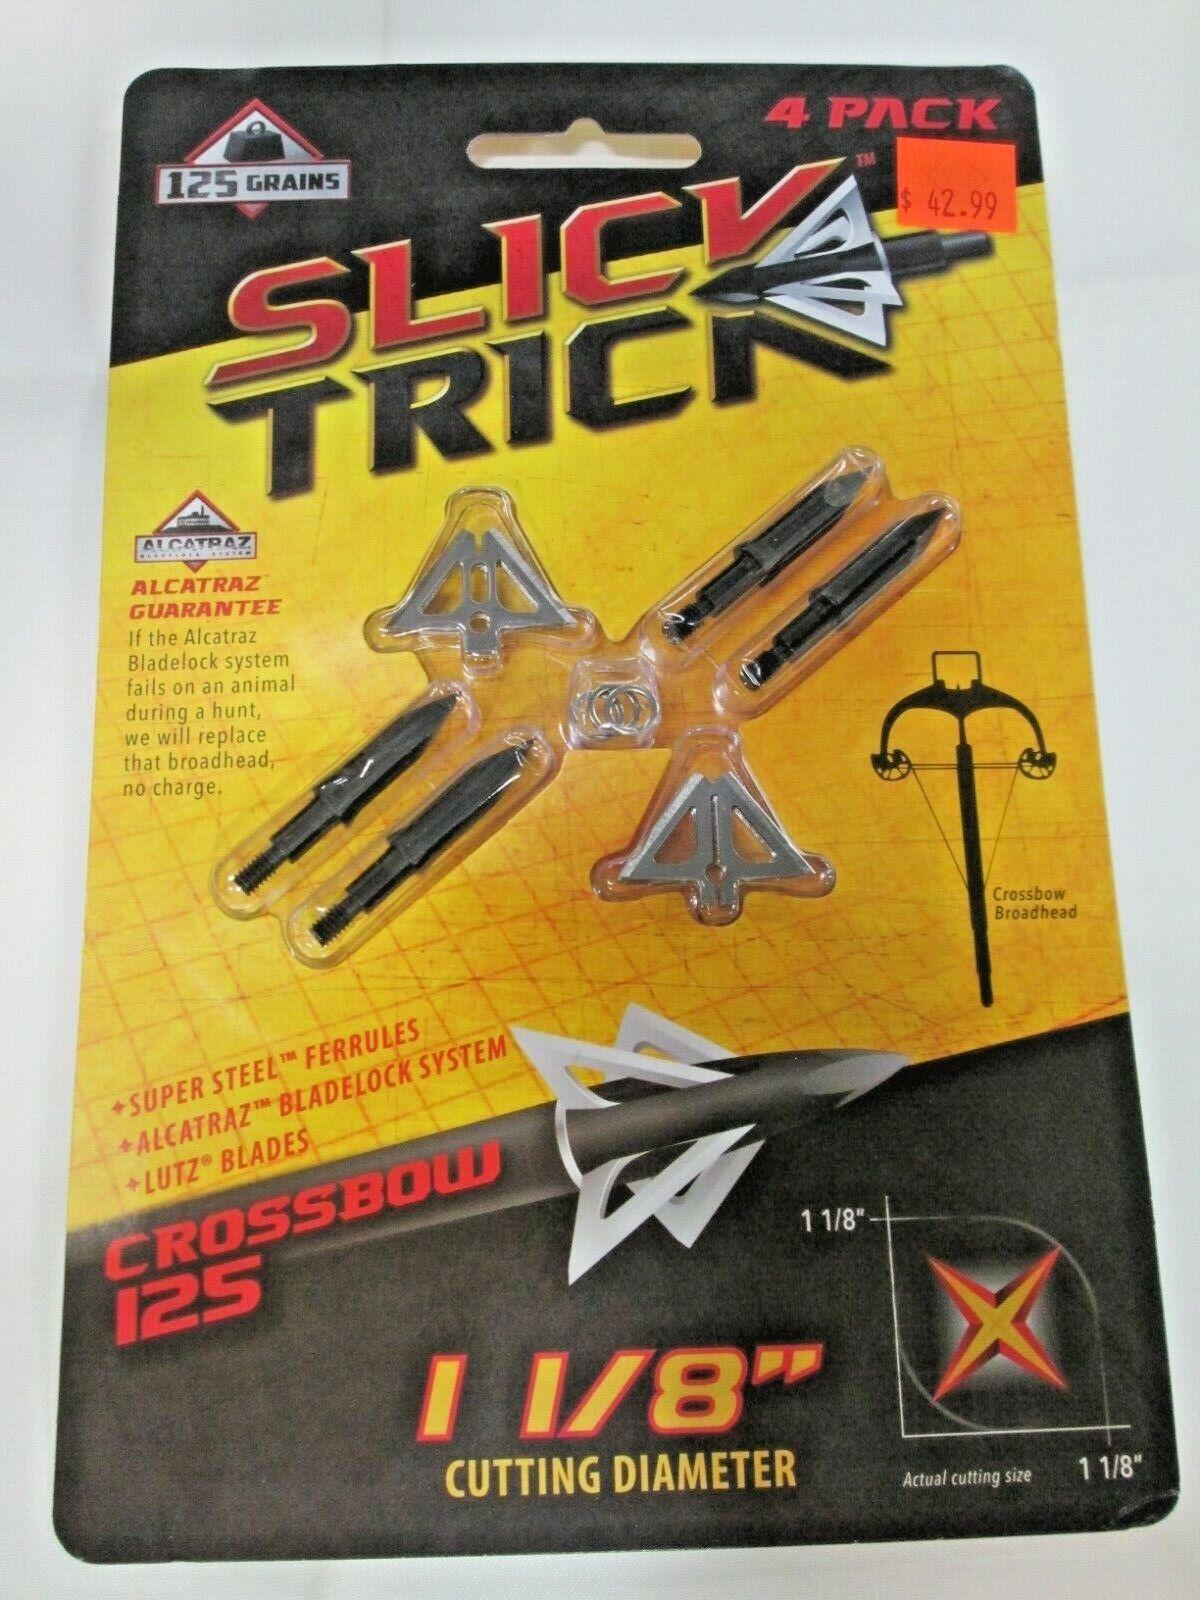 Slick Trick Broadheads Crossbow 4pk 125 Grain 4 Blade Stx125 XBOW #05542 for sale online